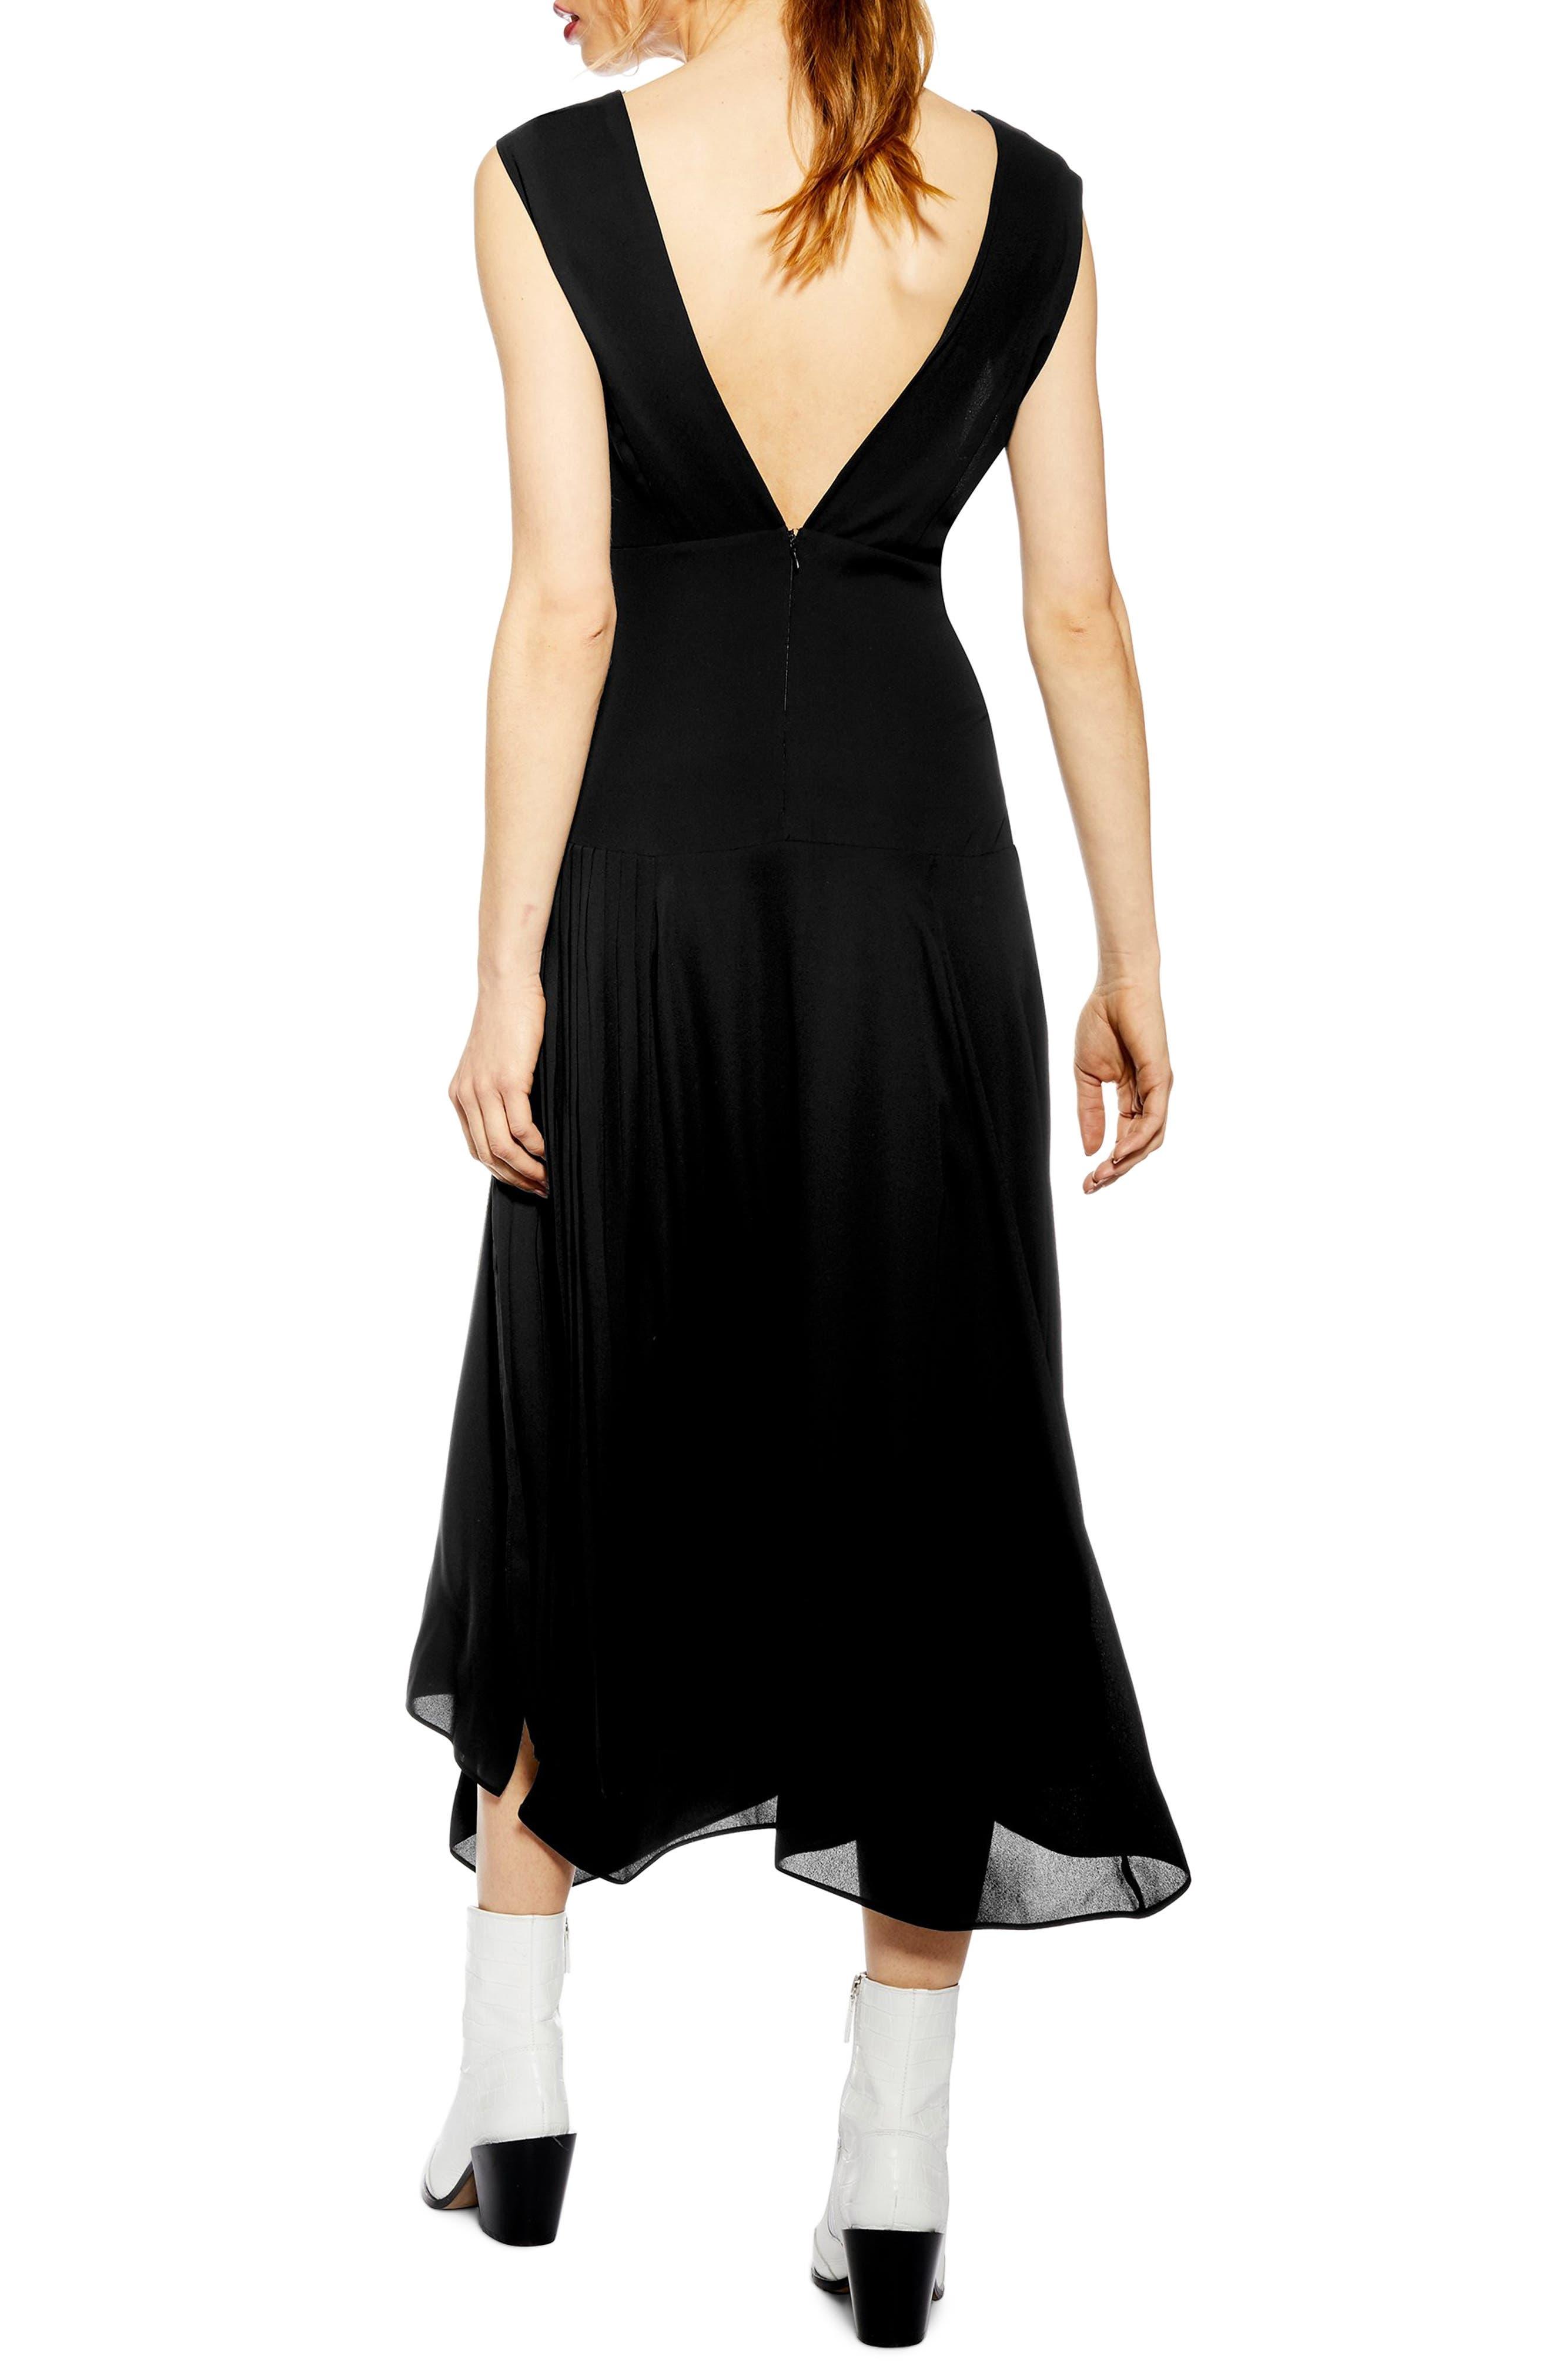 TOPSHOP, Pleated Pinafore Midi Dress, Alternate thumbnail 2, color, BLACK